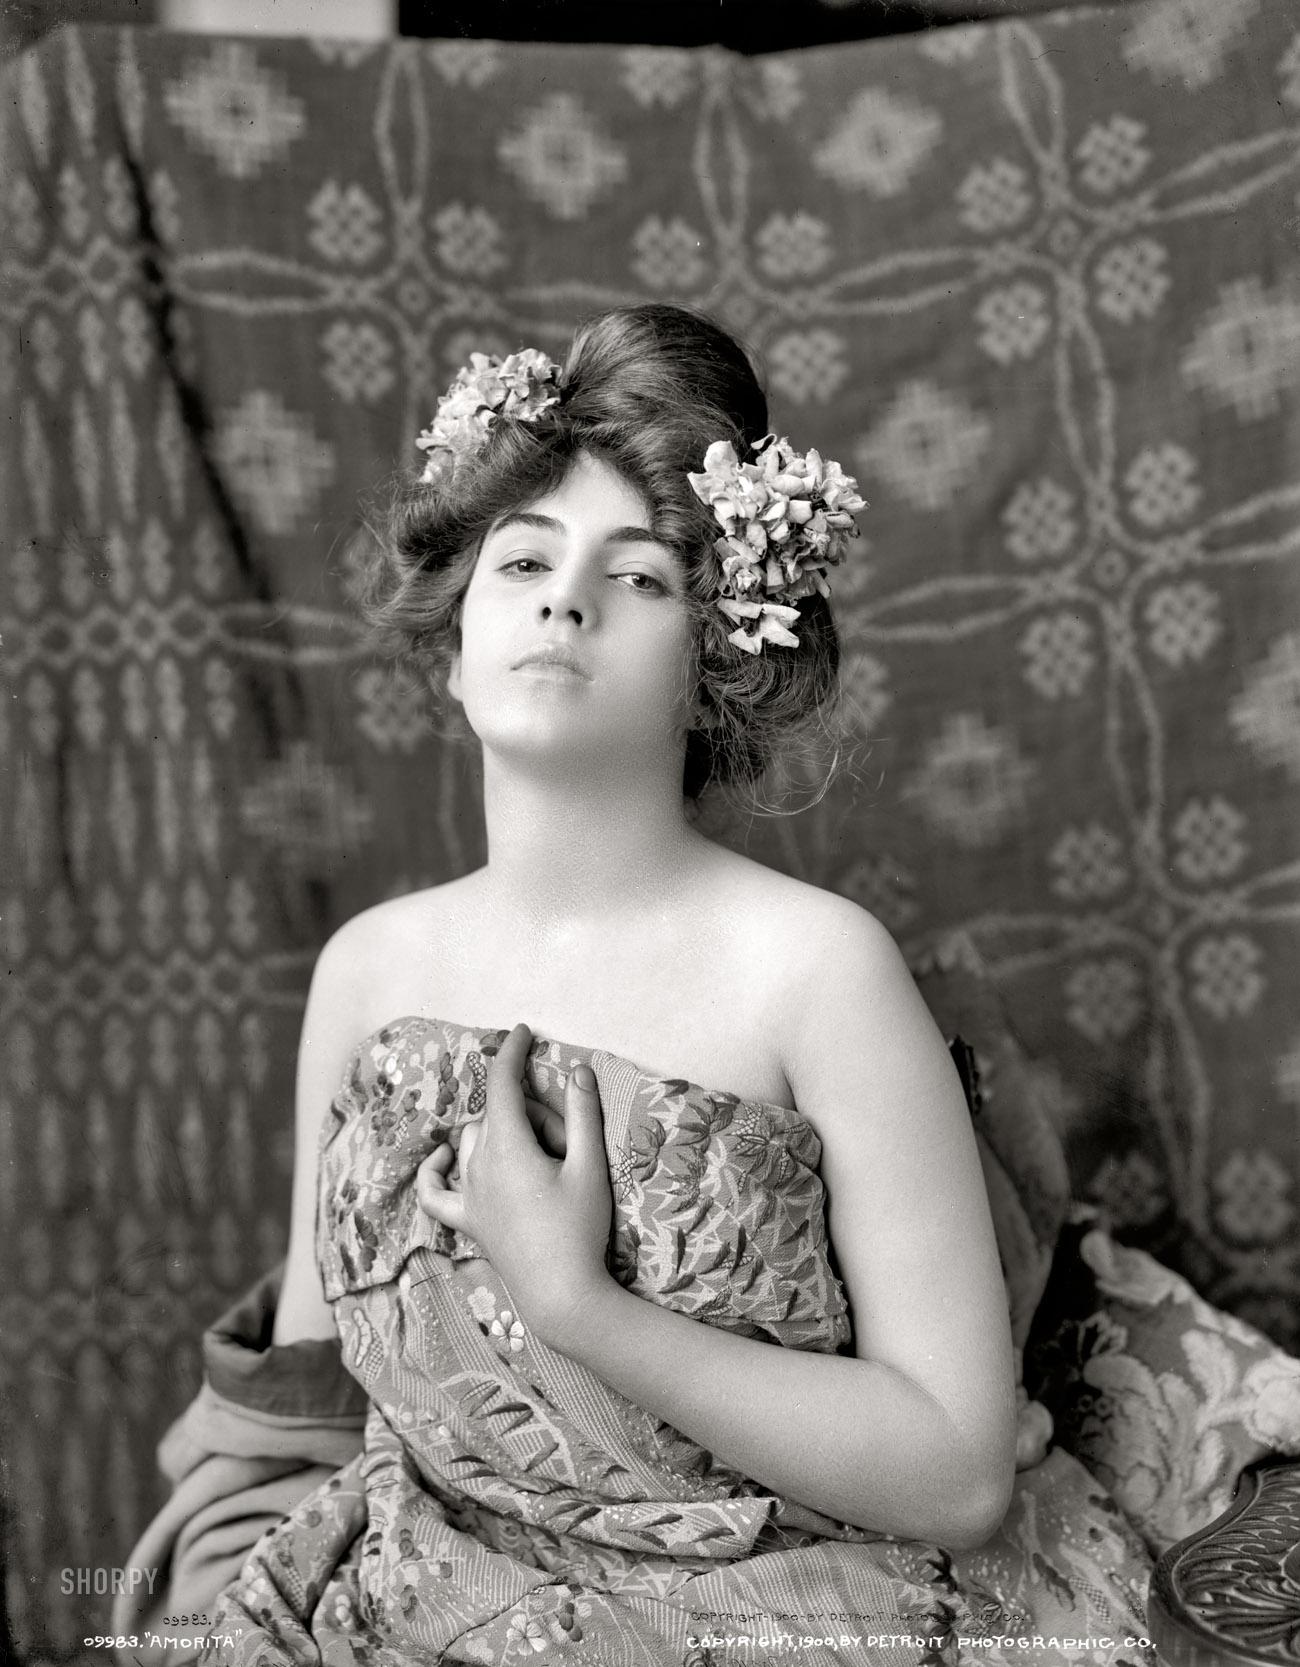 Фото ретро женщин 19 века 17 фотография